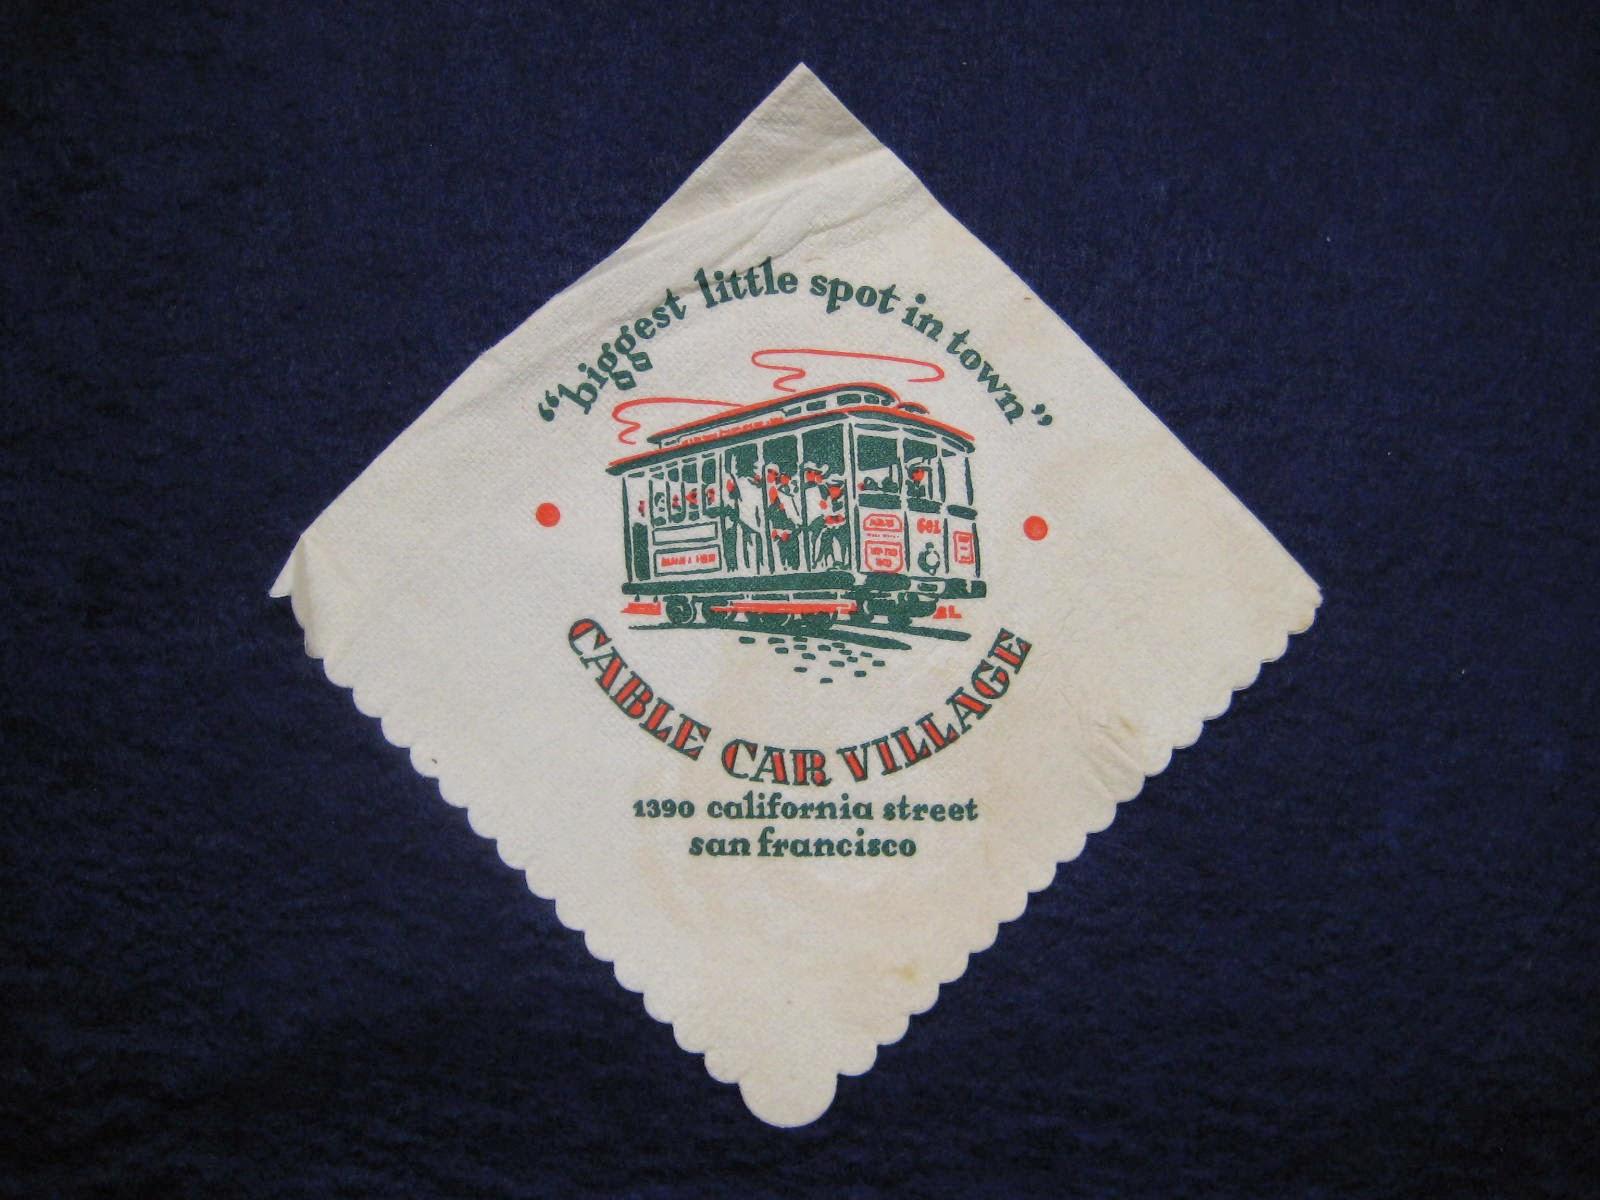 r Village, San Francisco History Center, San Francisco Public Library